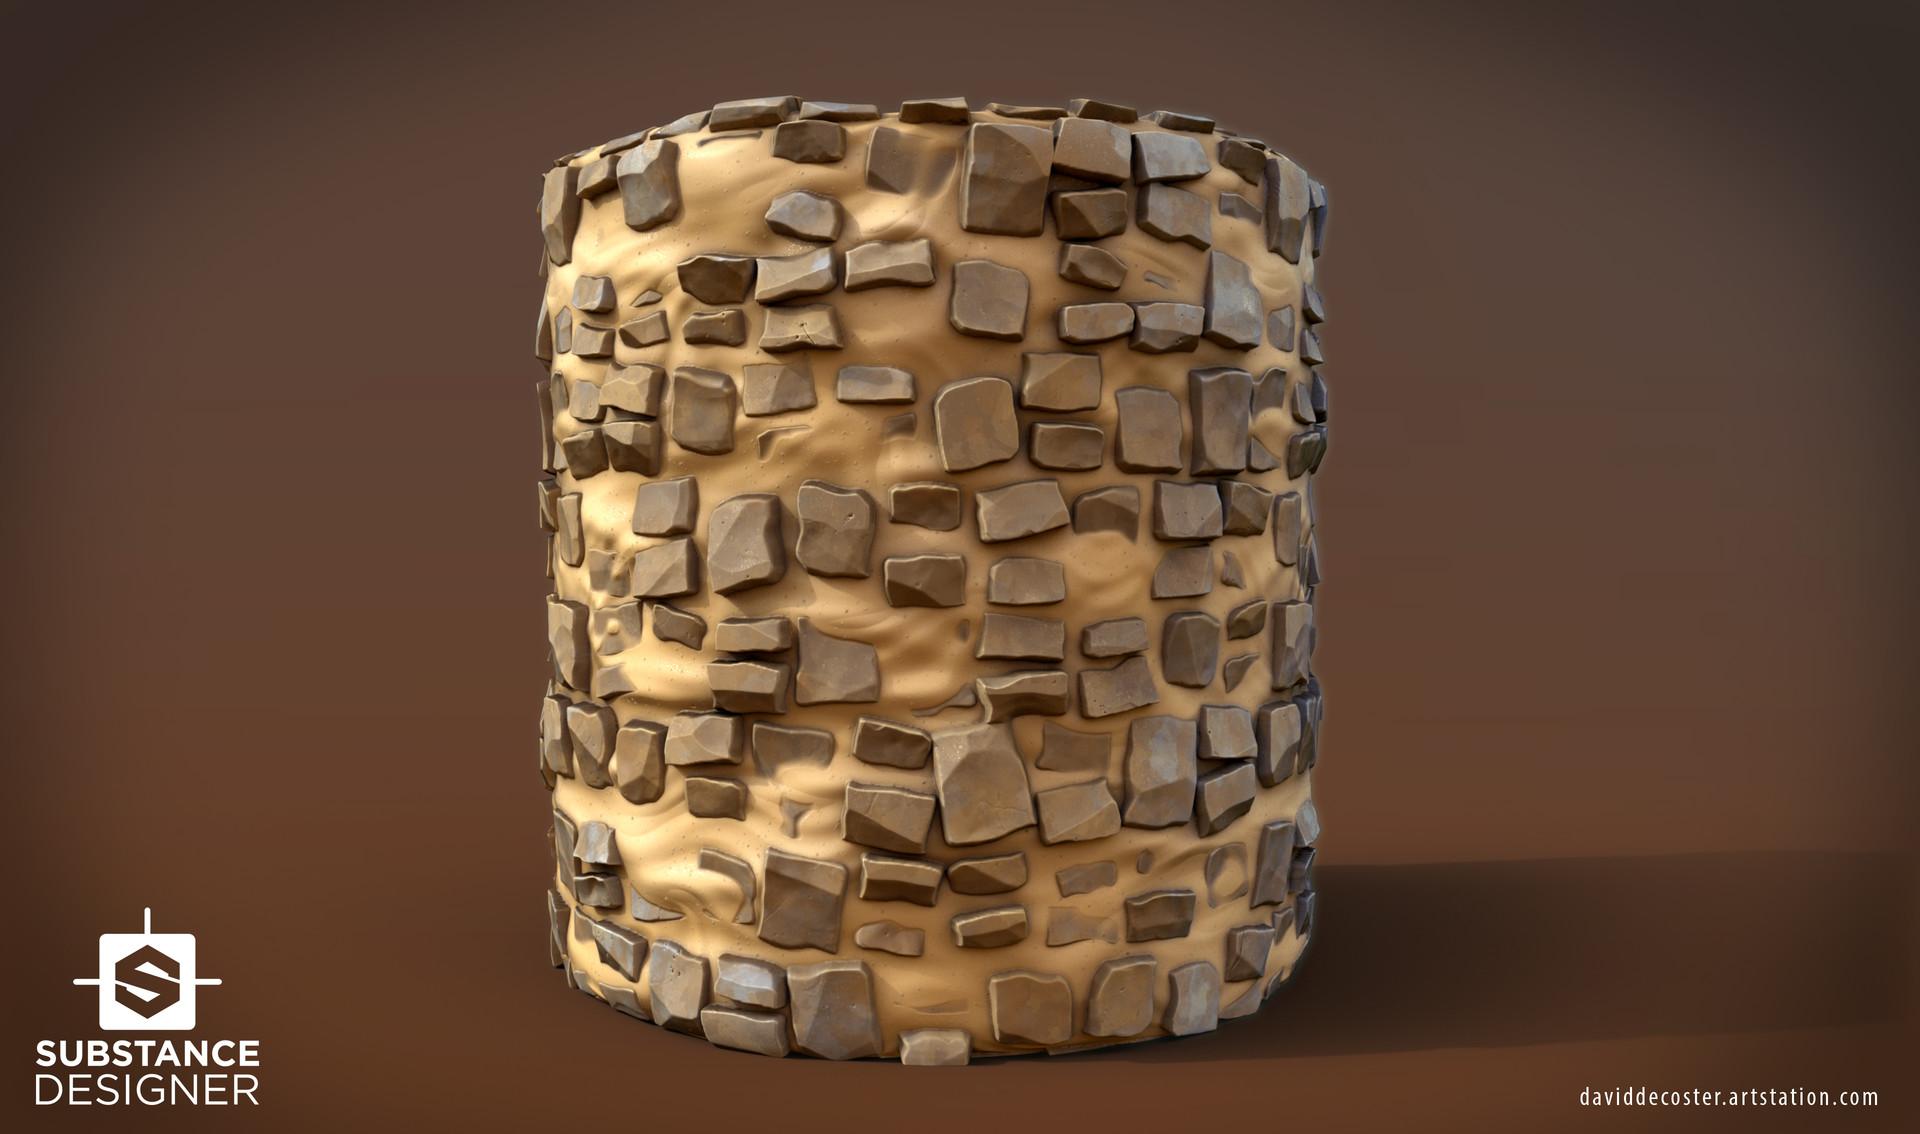 David decoster decoster sandy bricks cyl 02